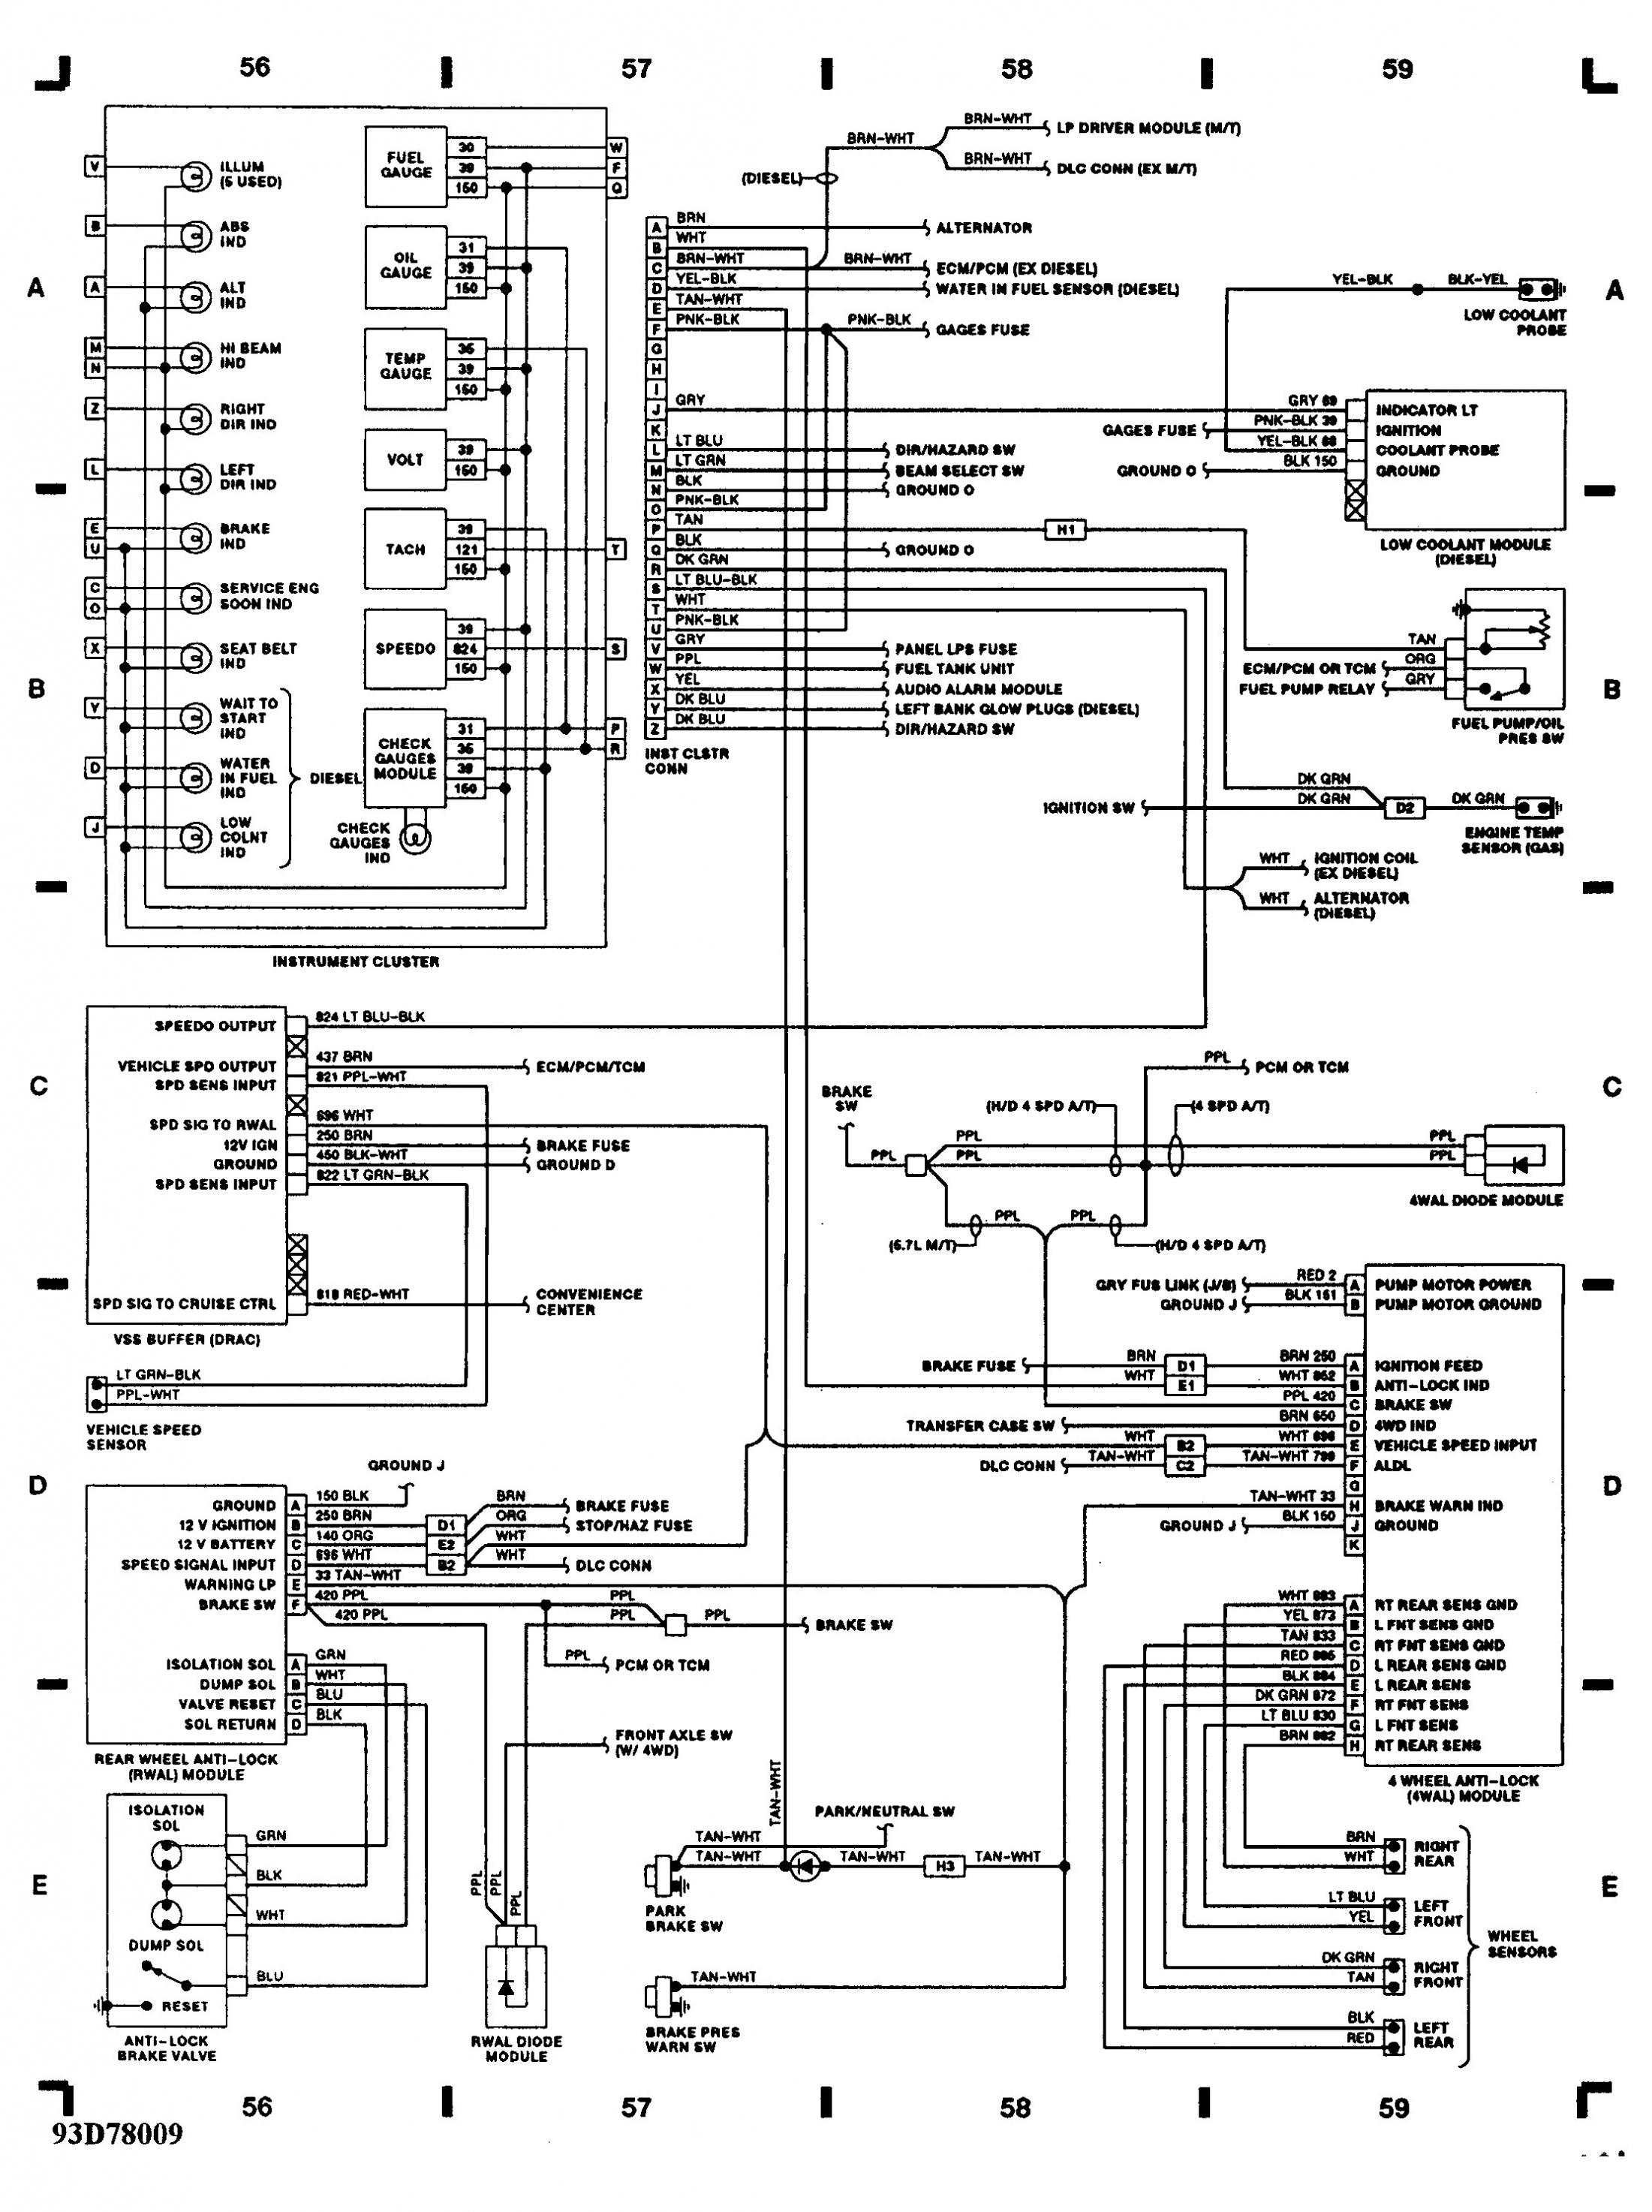 2001 Dodge Ram 1500 Trailer Wiring Diagram New Wiring Diagram Ifor - Dodge Ram Wiring Harness Diagram